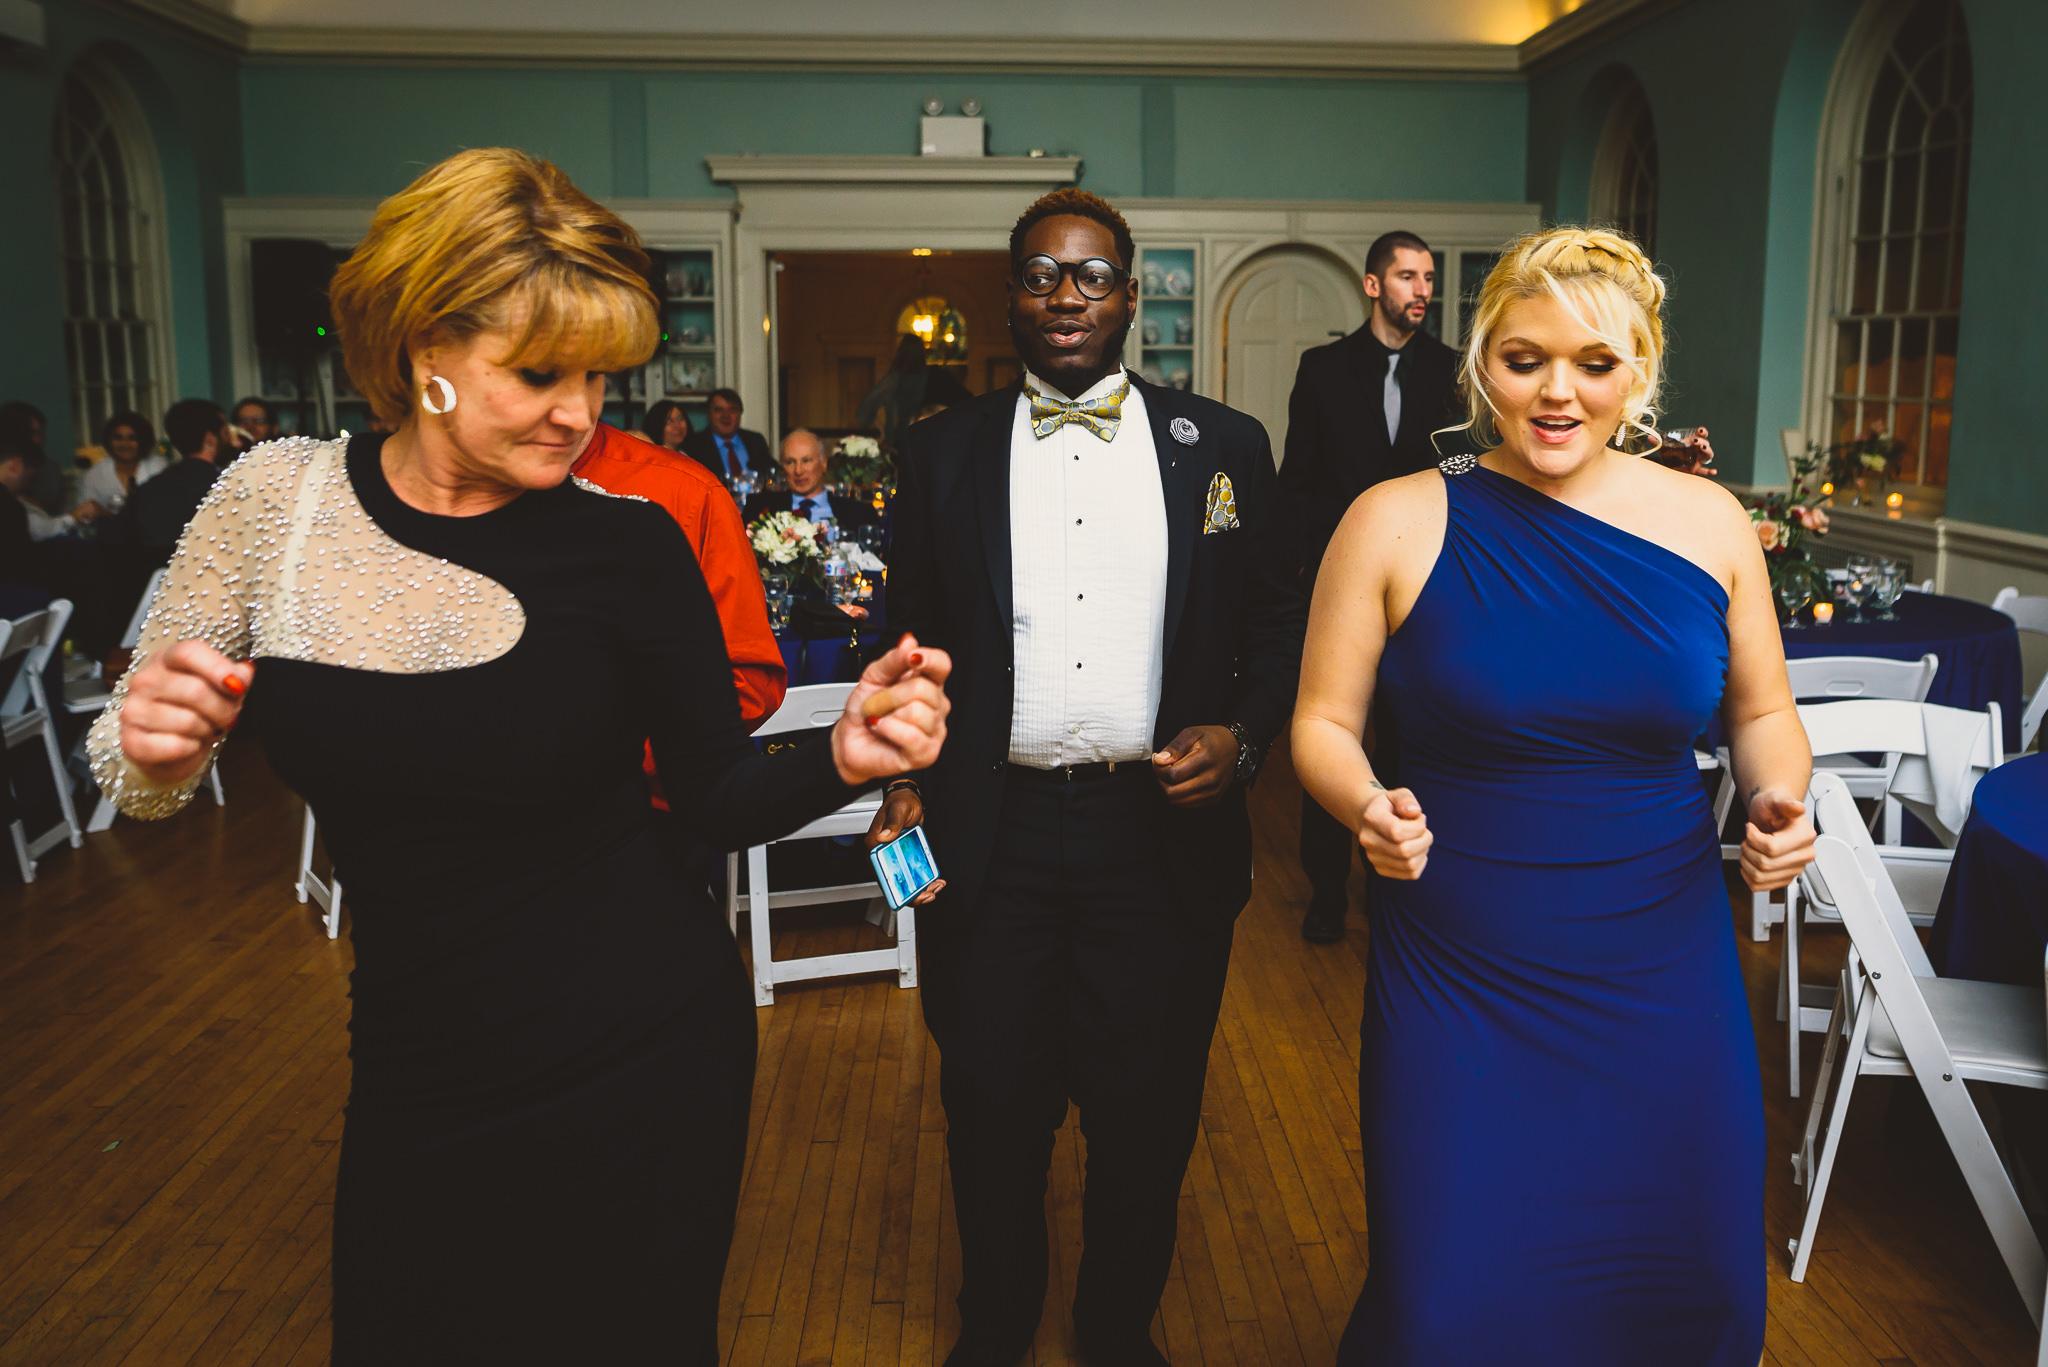 Colonial_Dames_Society_Wedding-0084.jpg